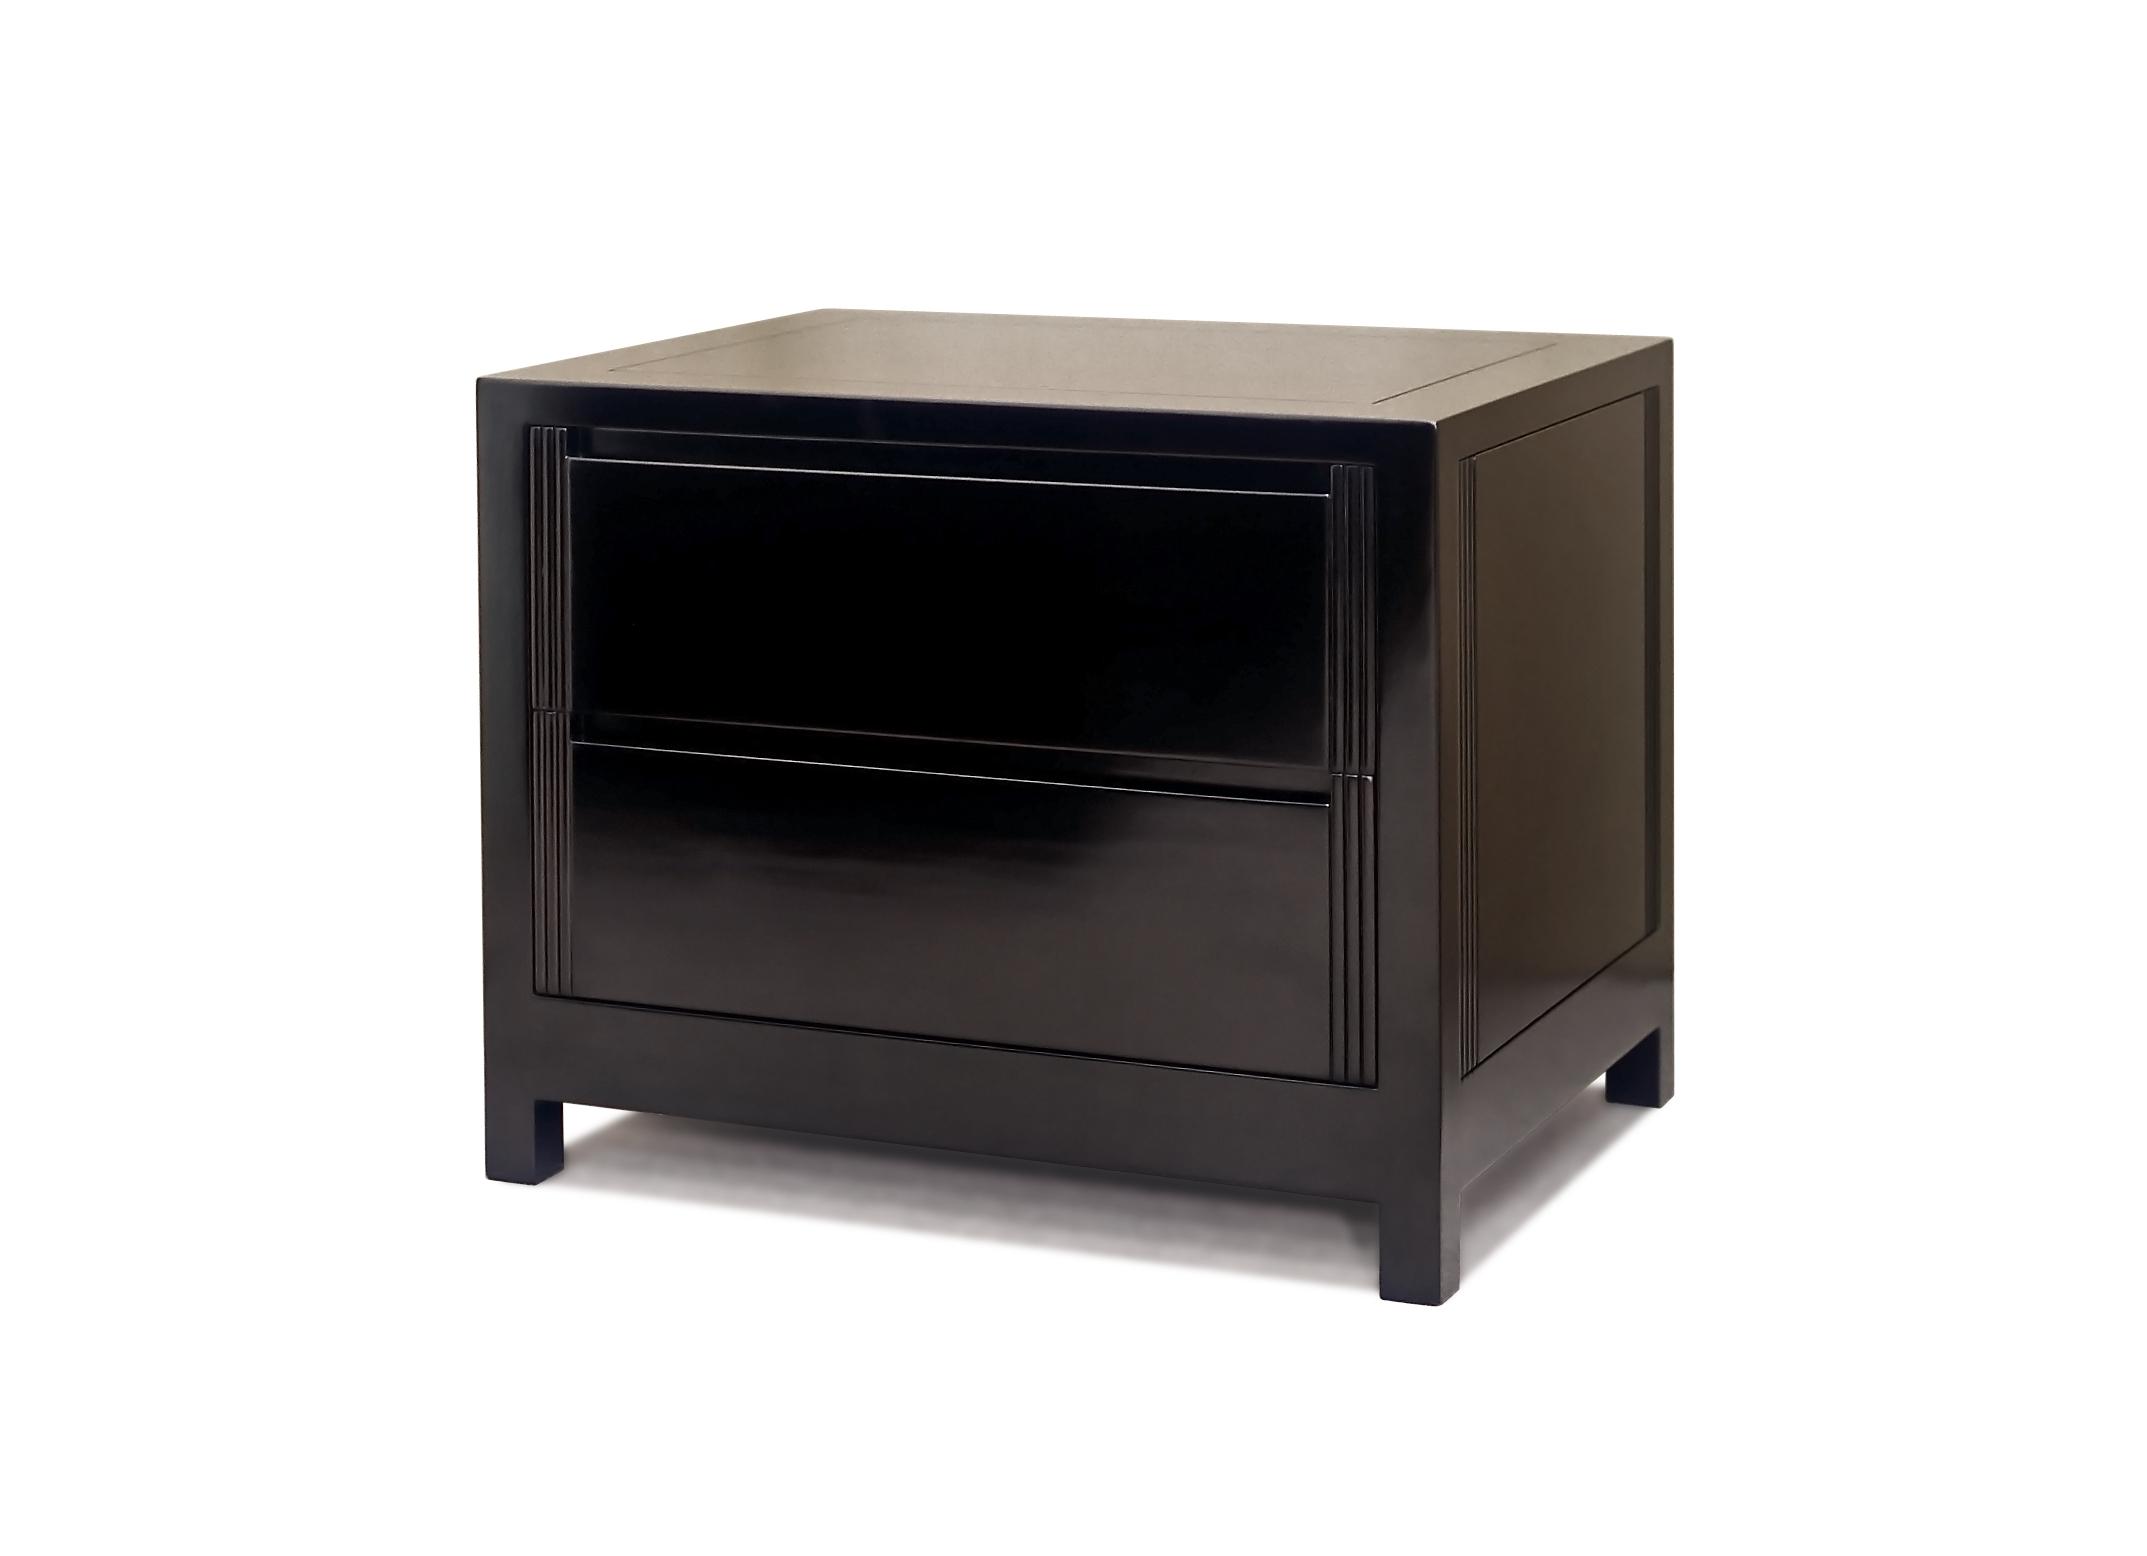 ....Art deco style furniture : chest of drawers..艺术装饰风格家具:抽屉柜....